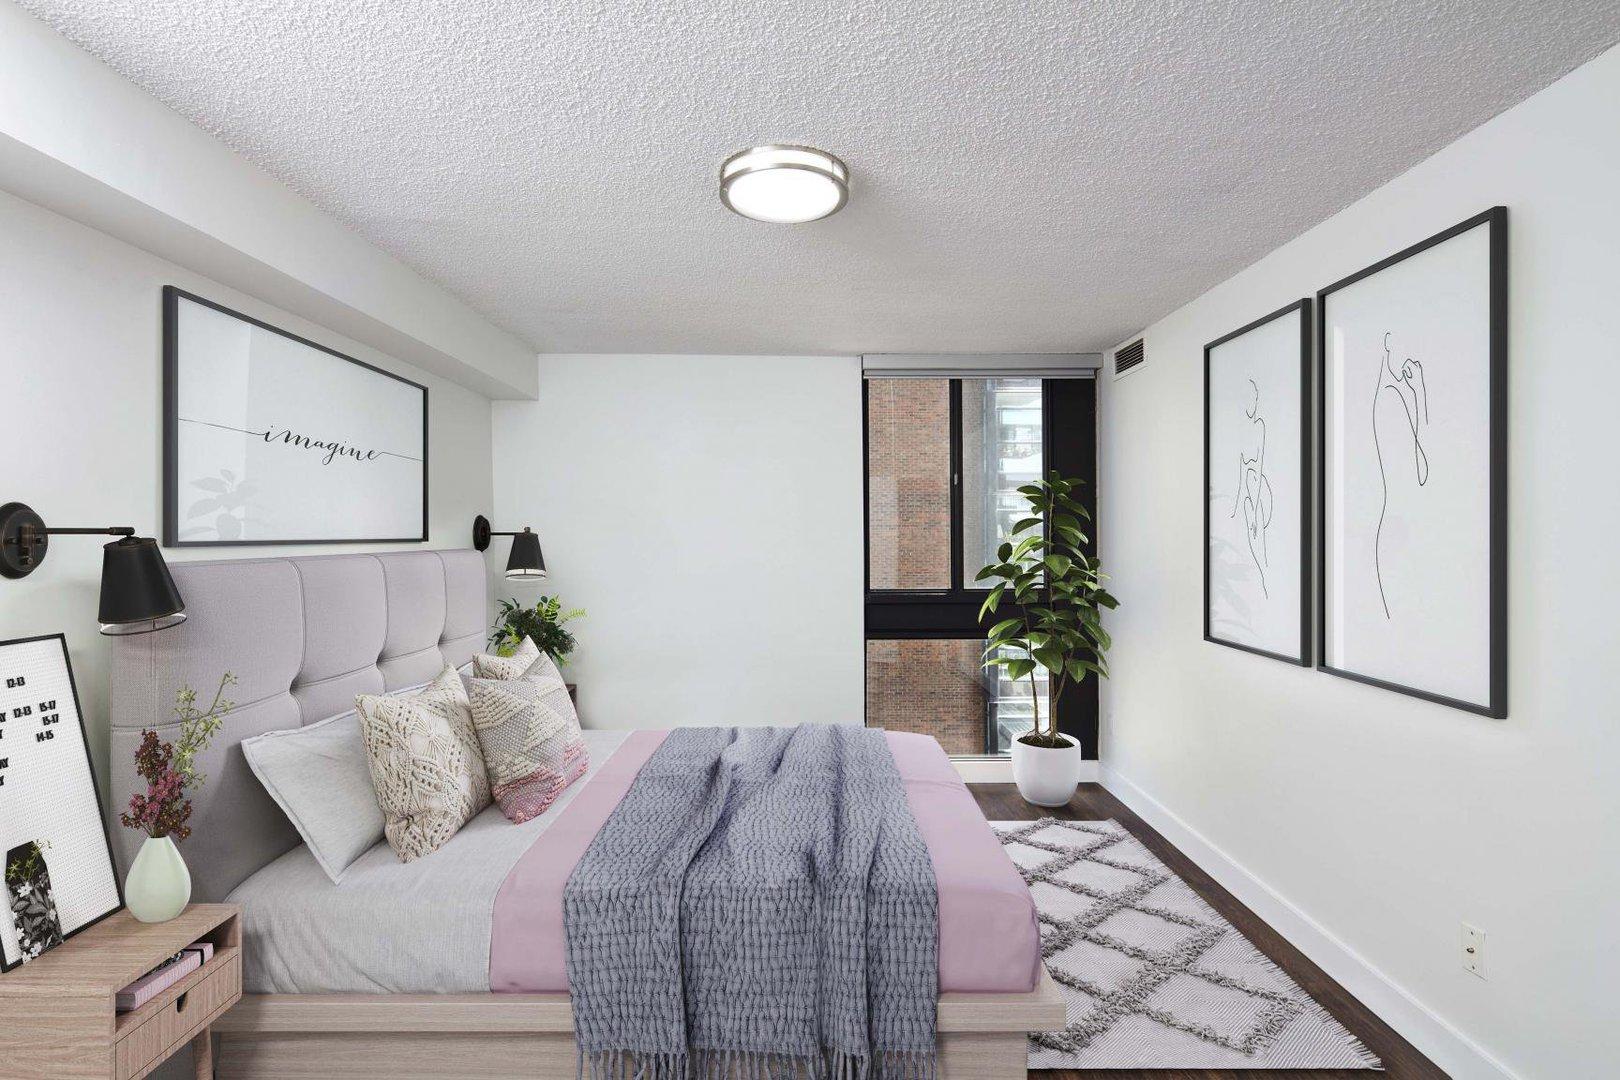 Outstanding Rentals Ca Toronto Apartments Condos And Houses For Rent Best Image Libraries Weasiibadanjobscom